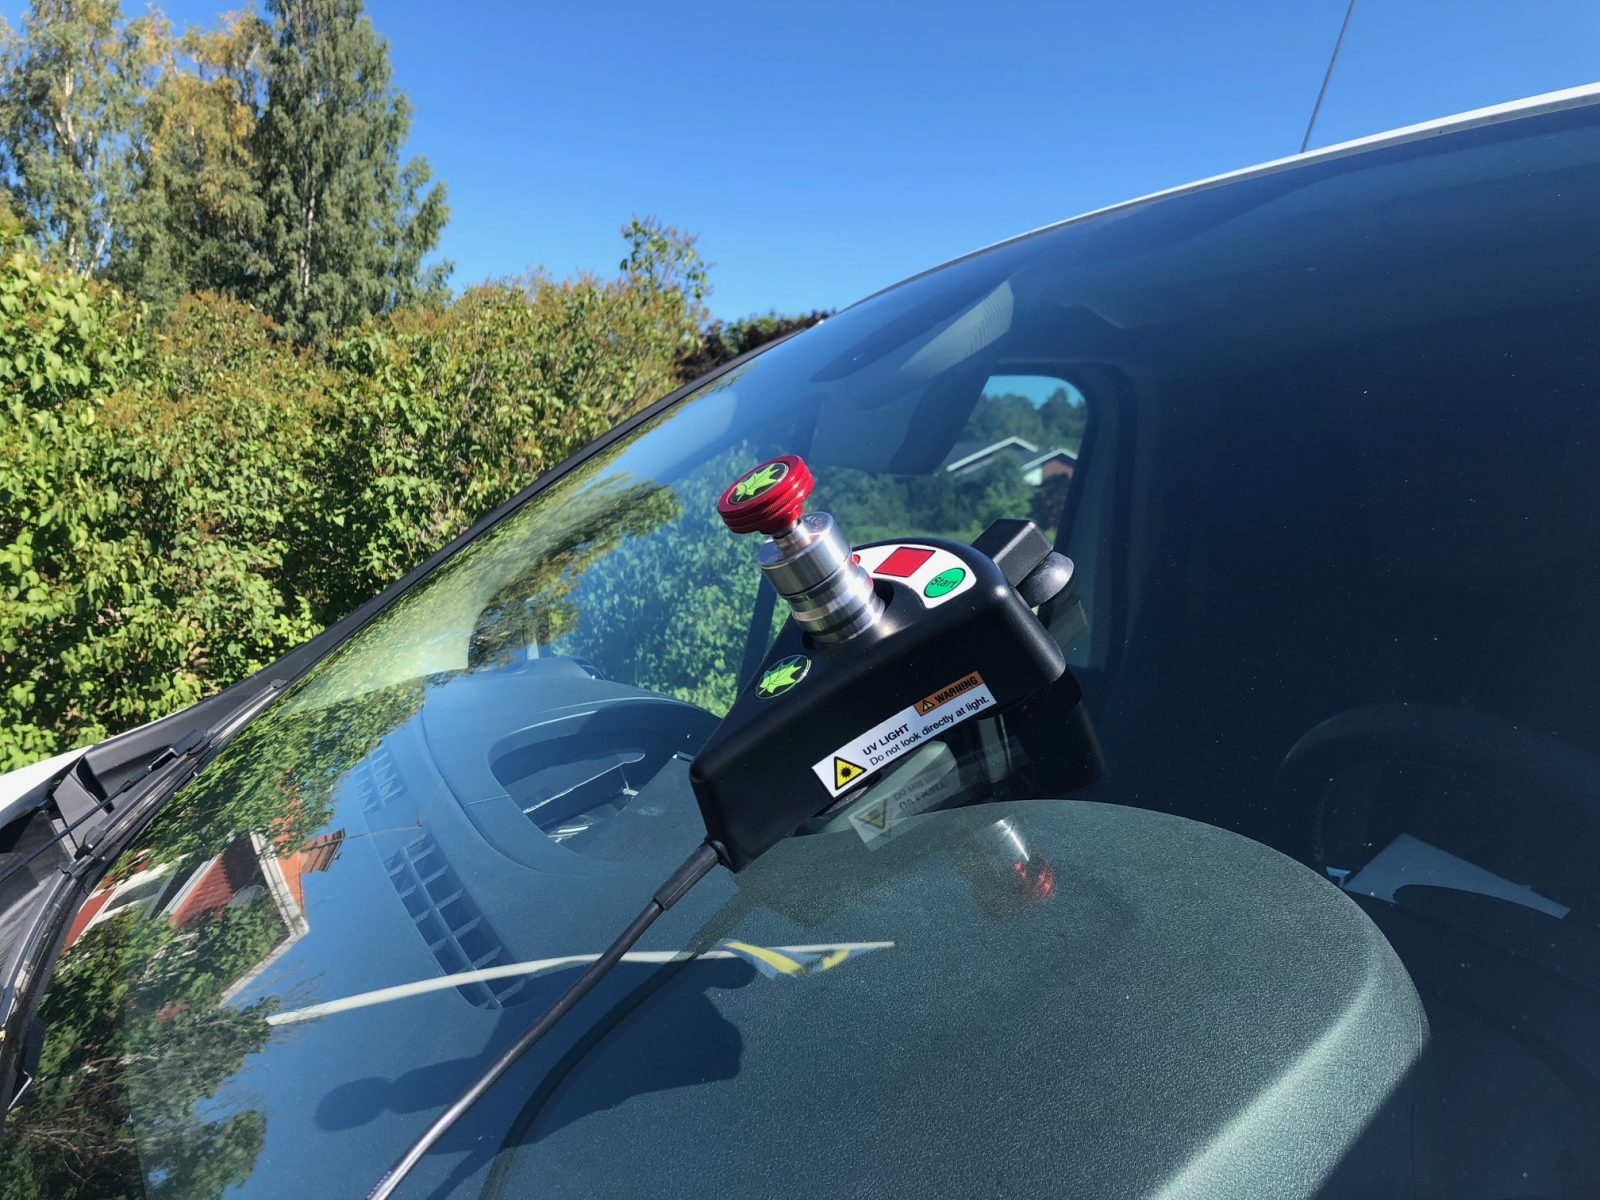 Windshield Repair Autoglass Restore International Ou